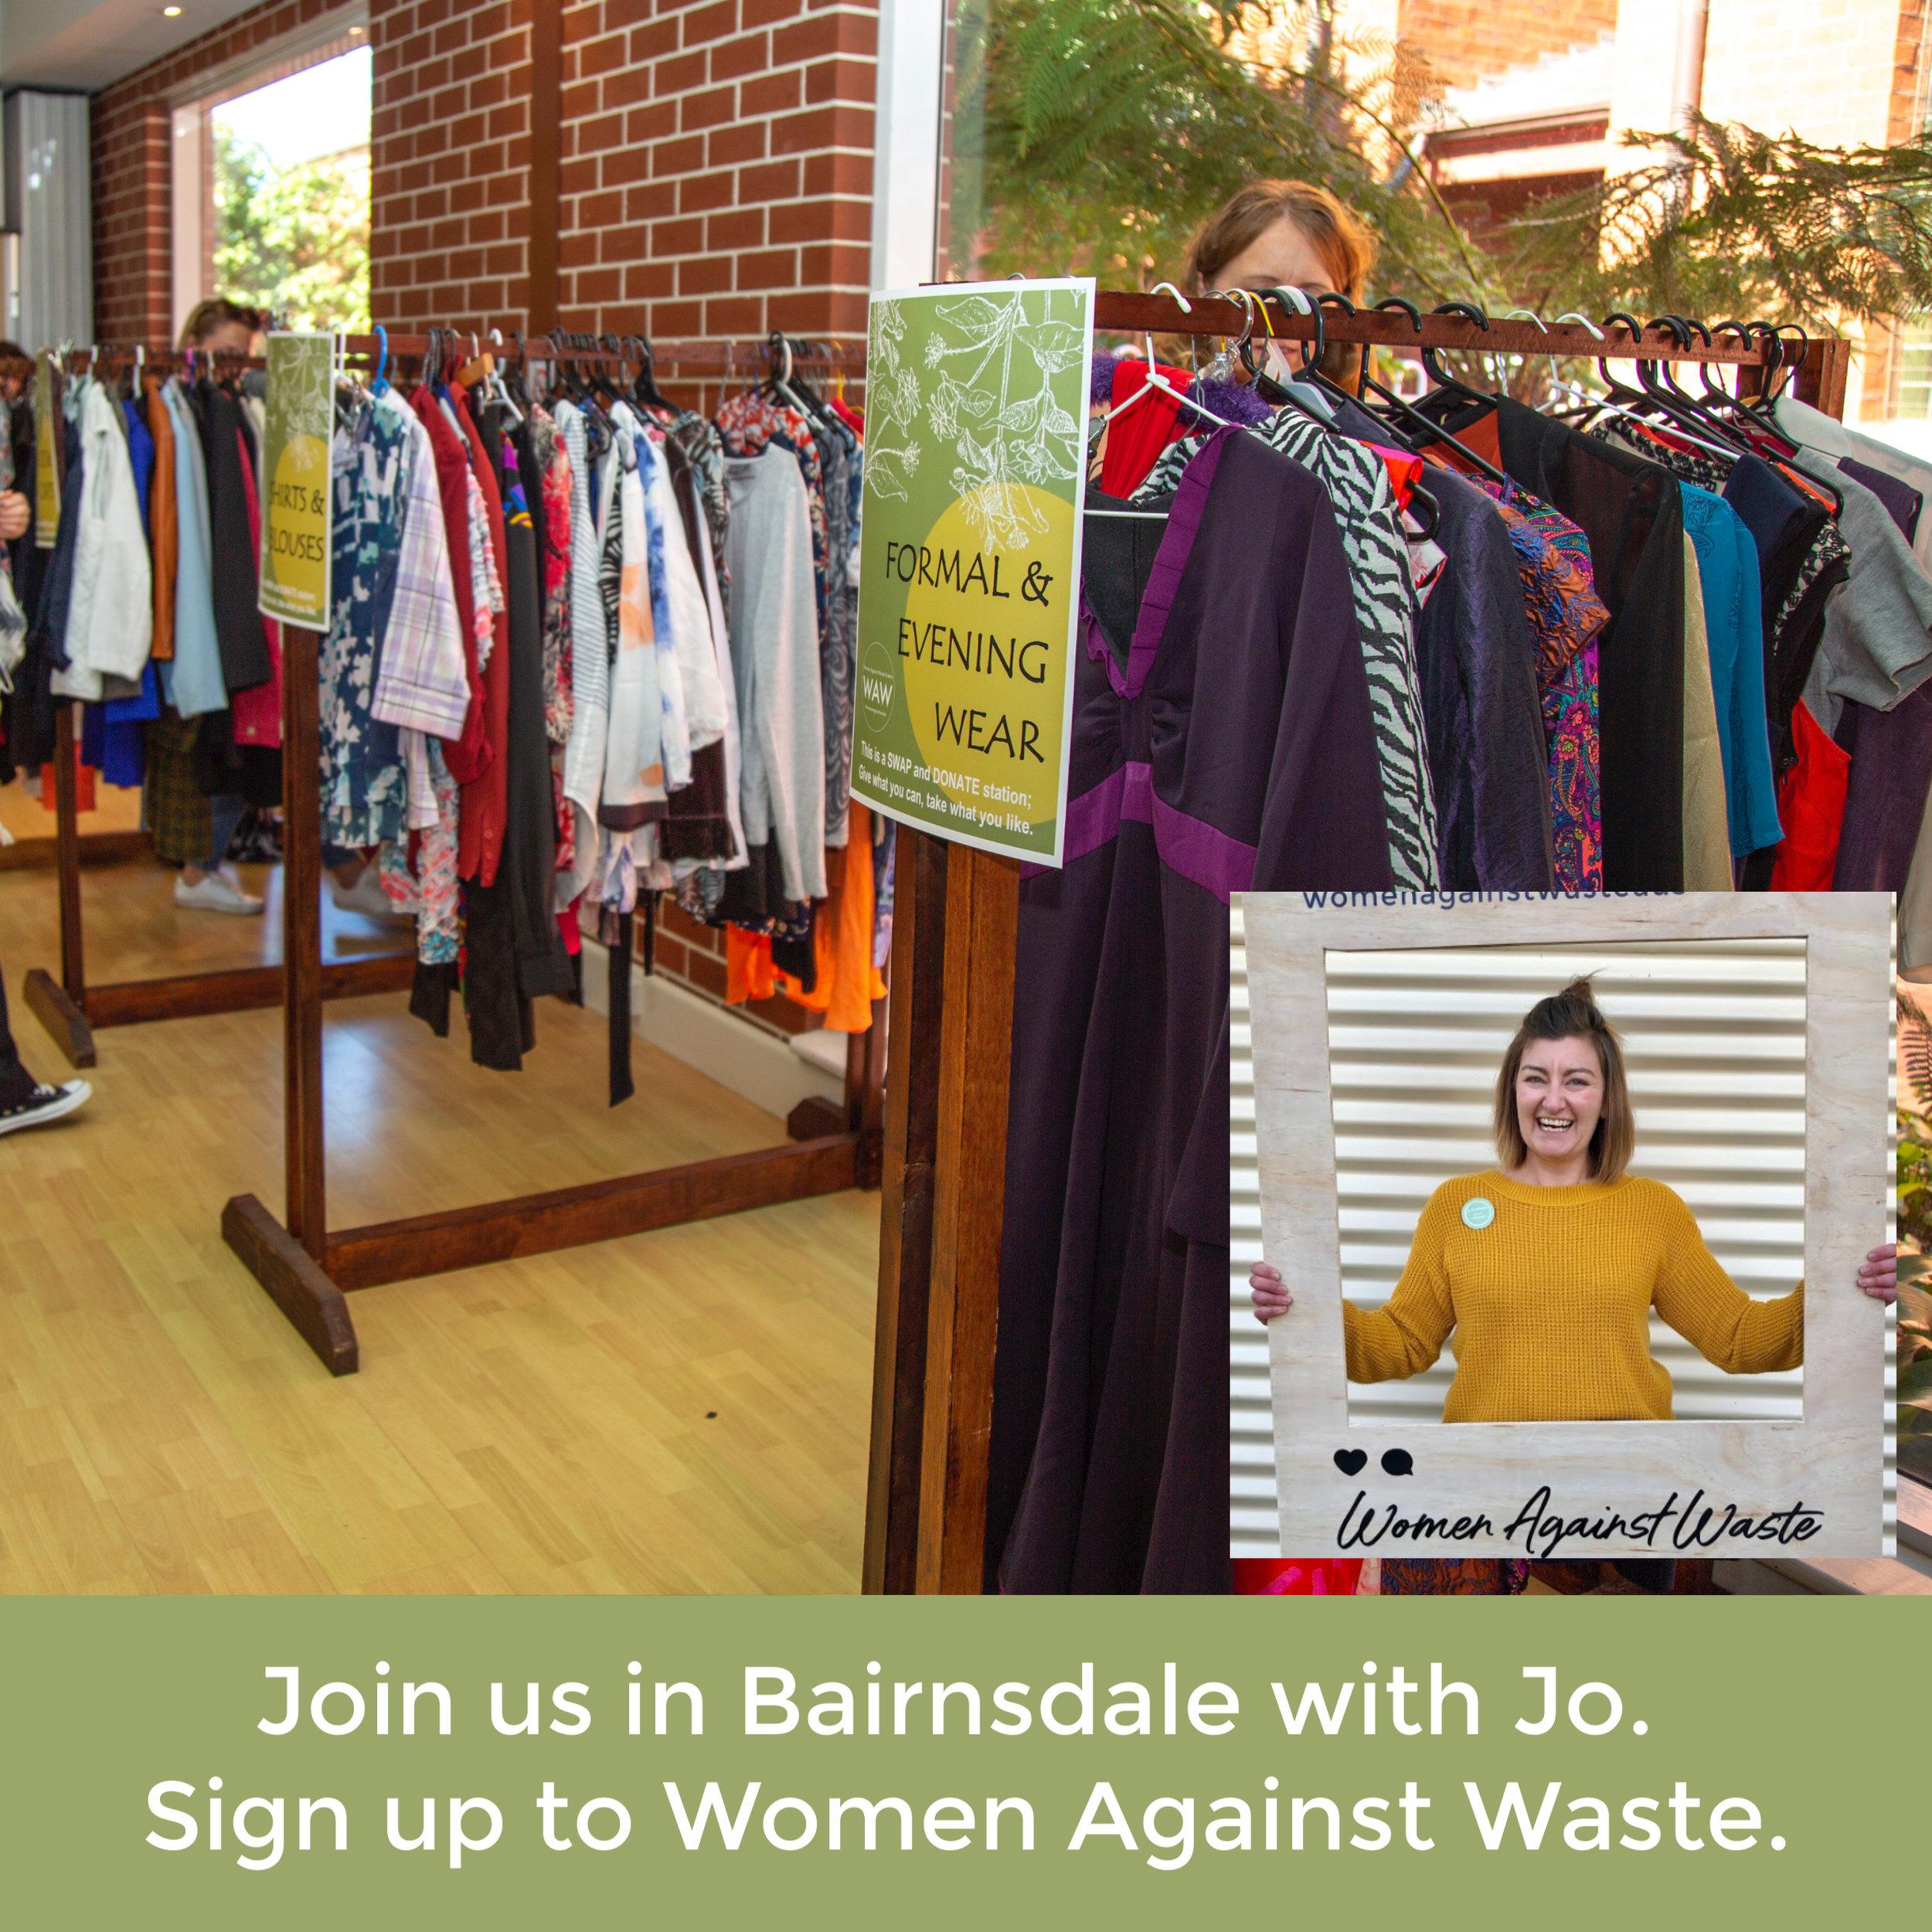 Bairnsdale Women Against Waste Event